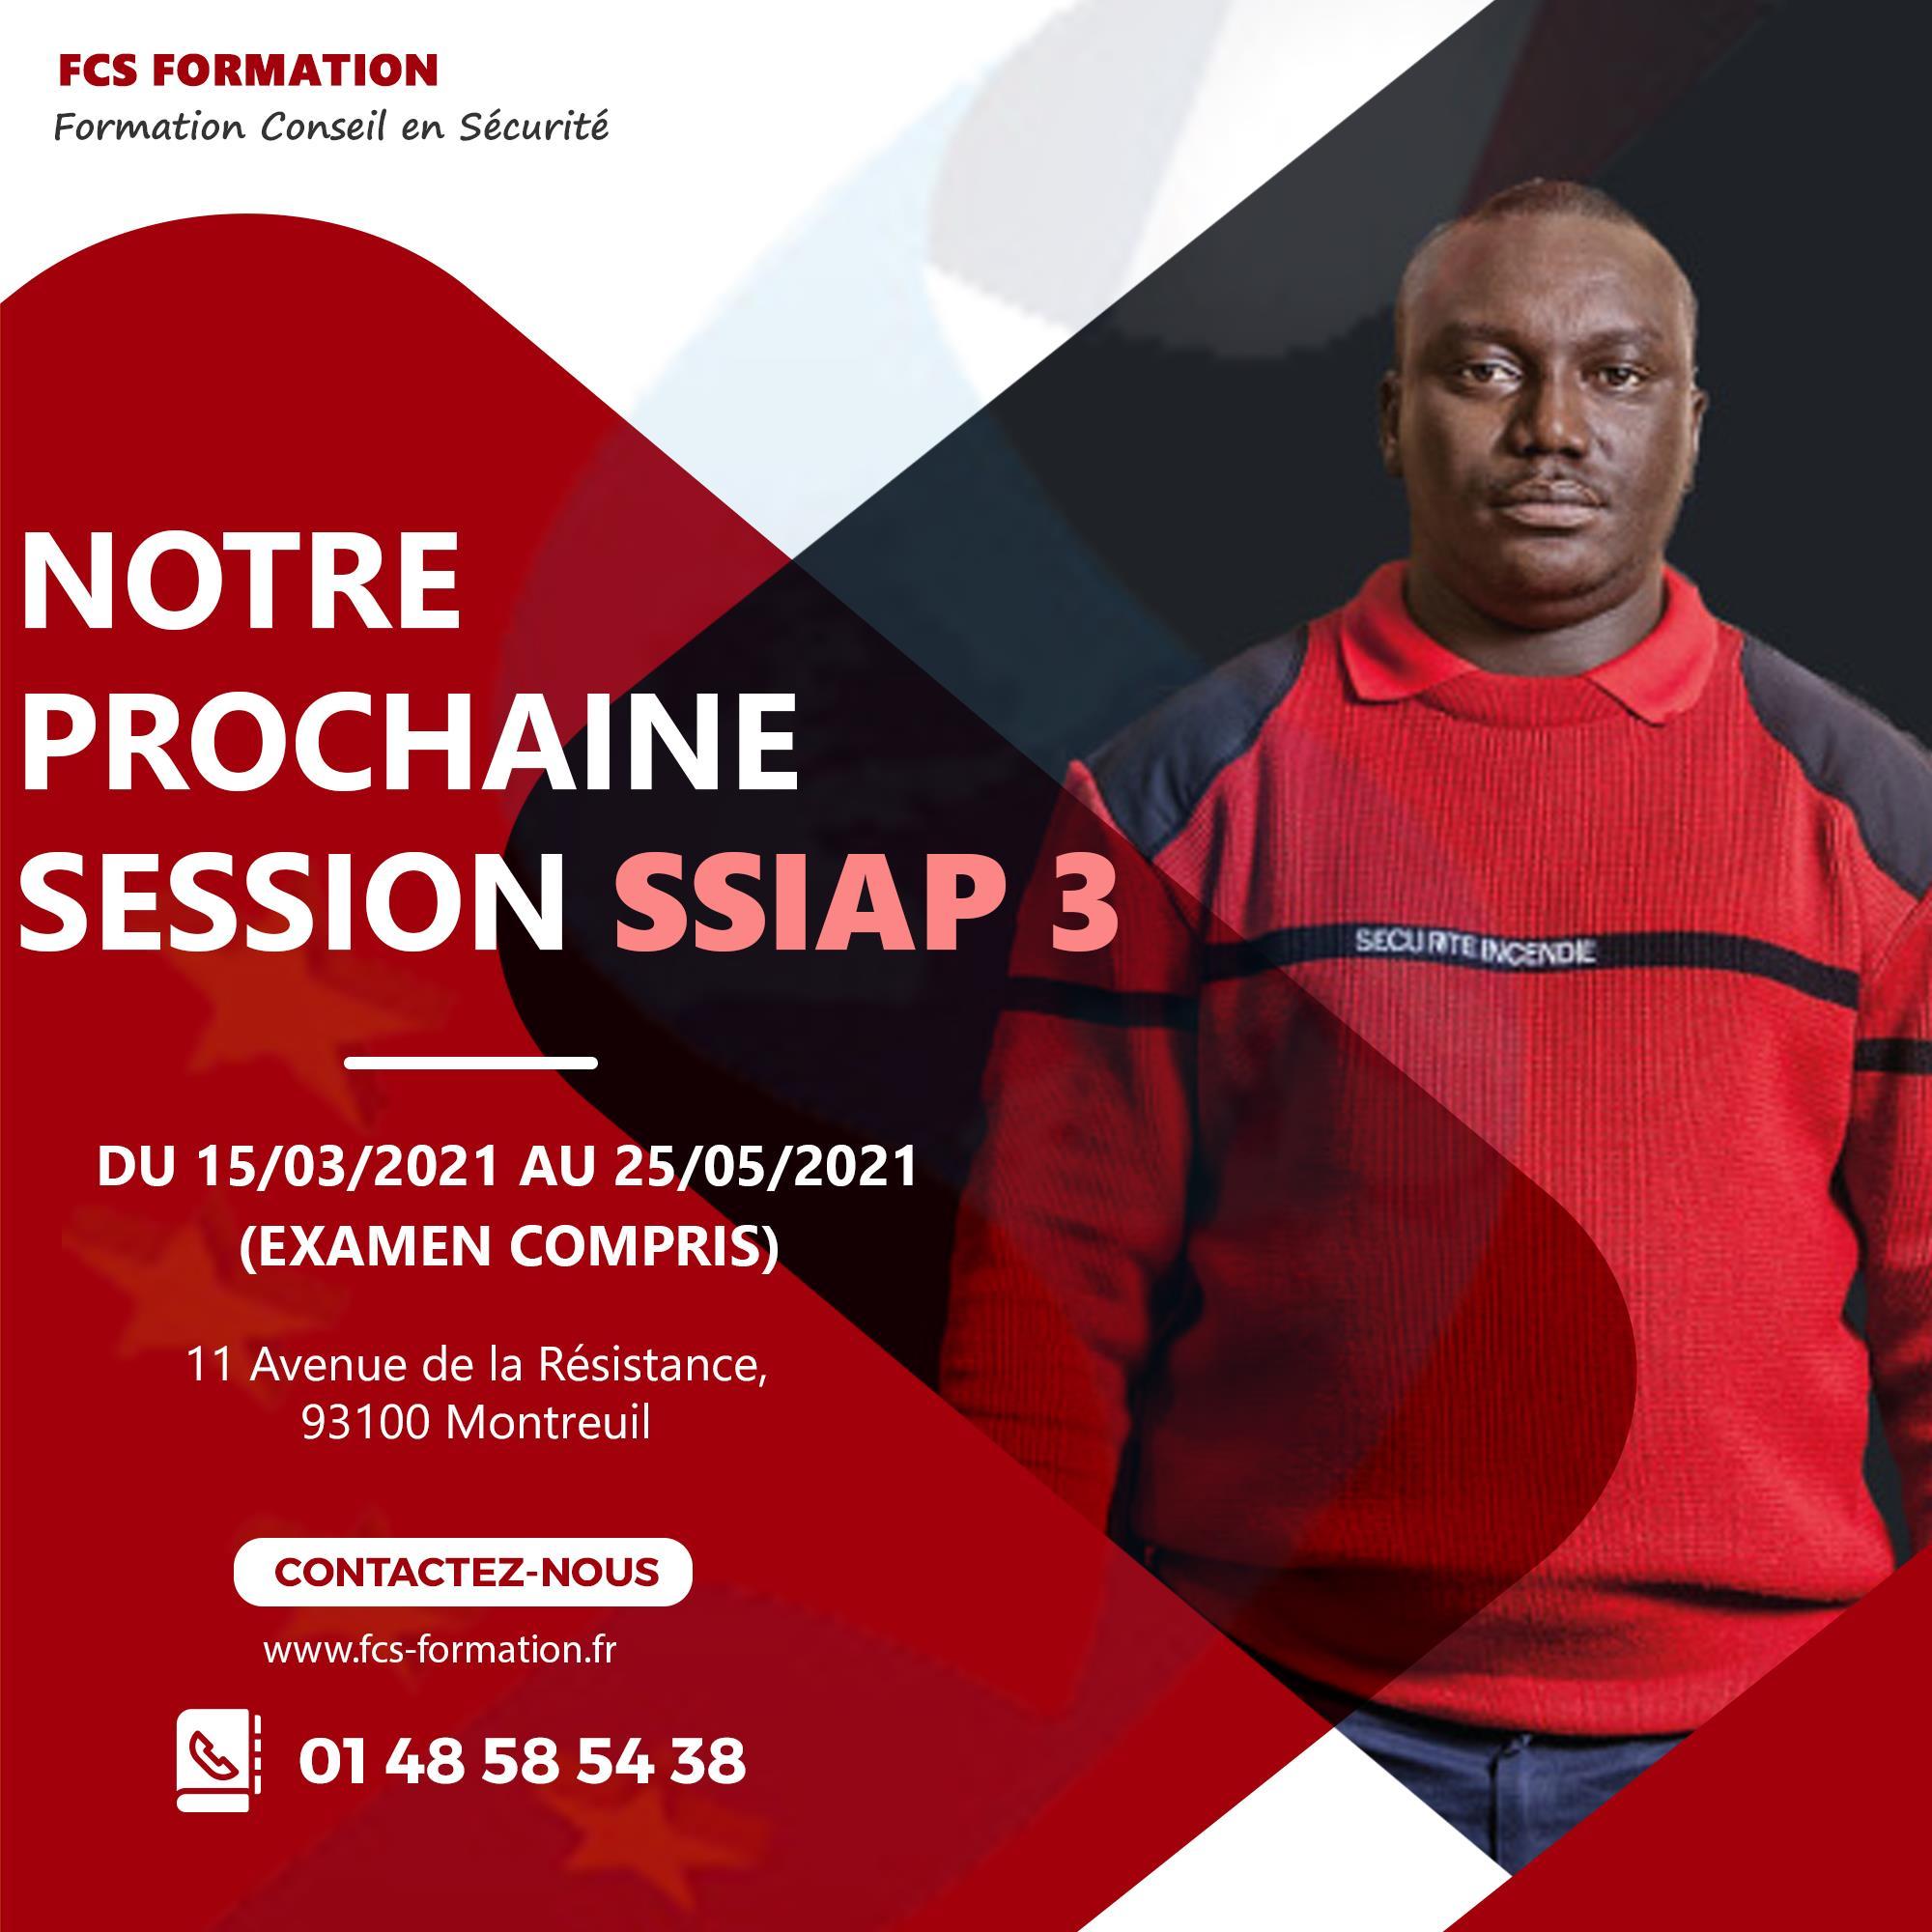 sessions ssiap 3 Recyclage & RAN SSIAP 3